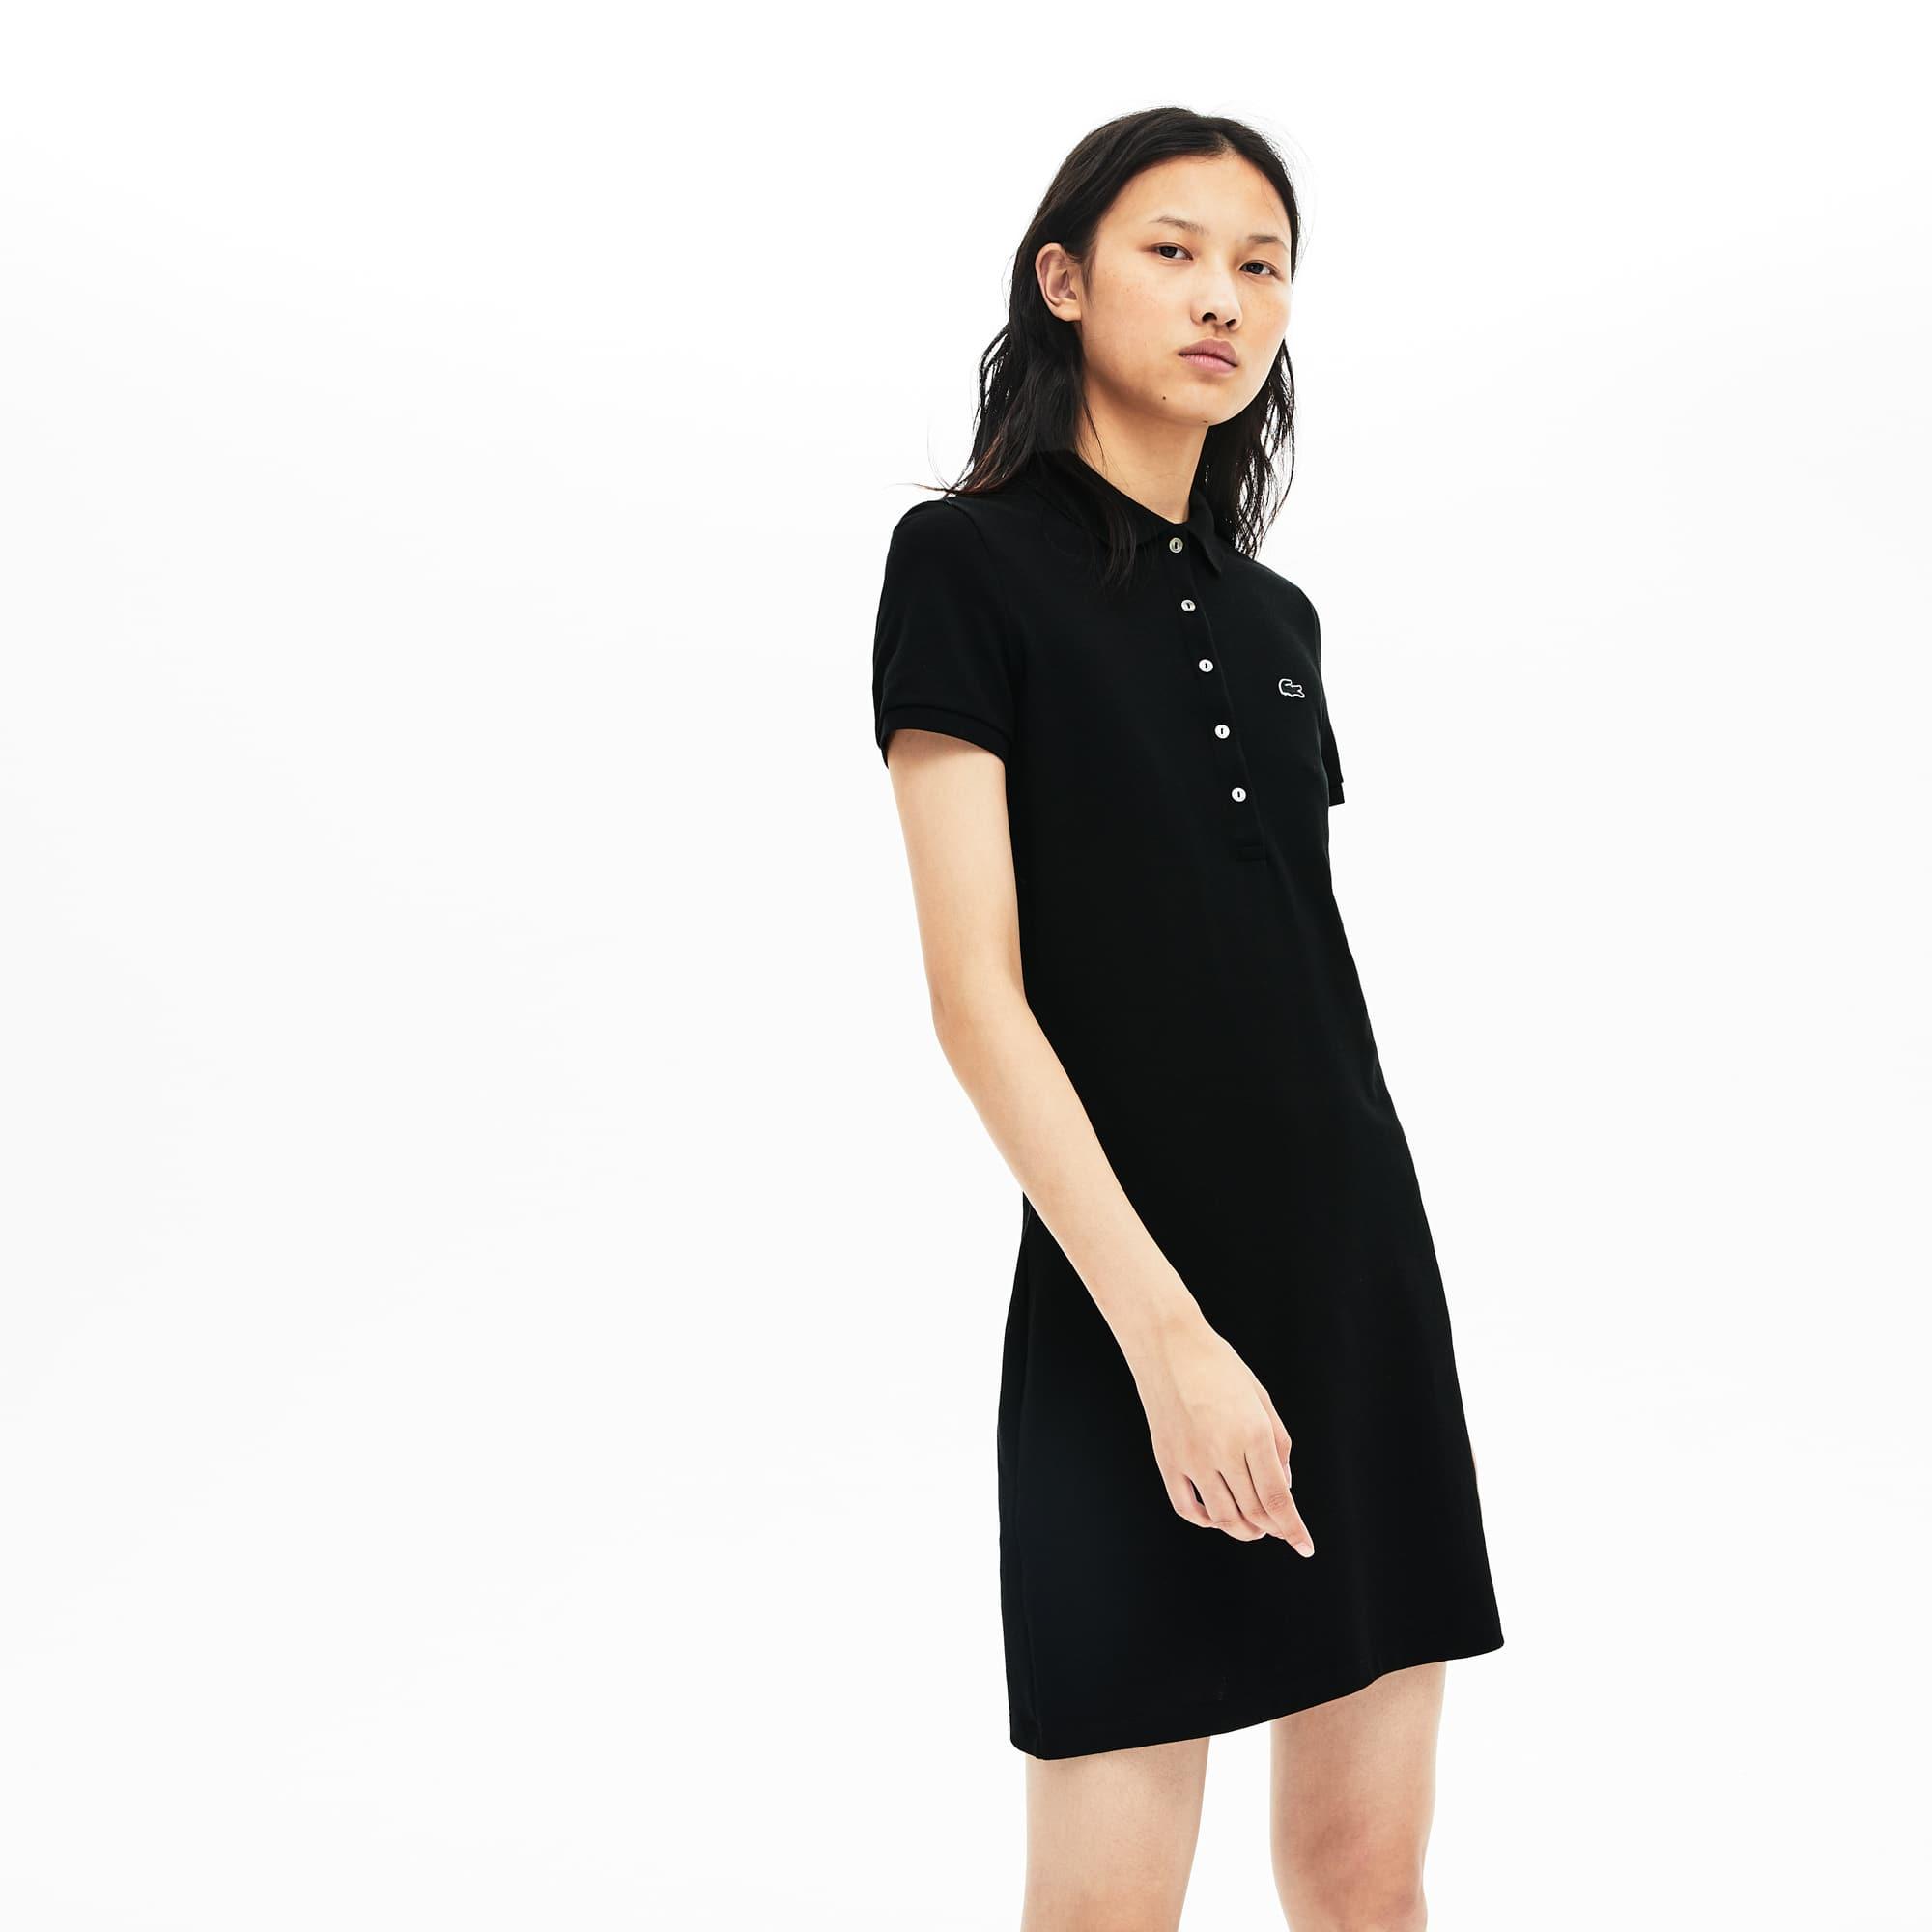 e6e872982 Women s Stretch Cotton Mini Piqué Polo Dress